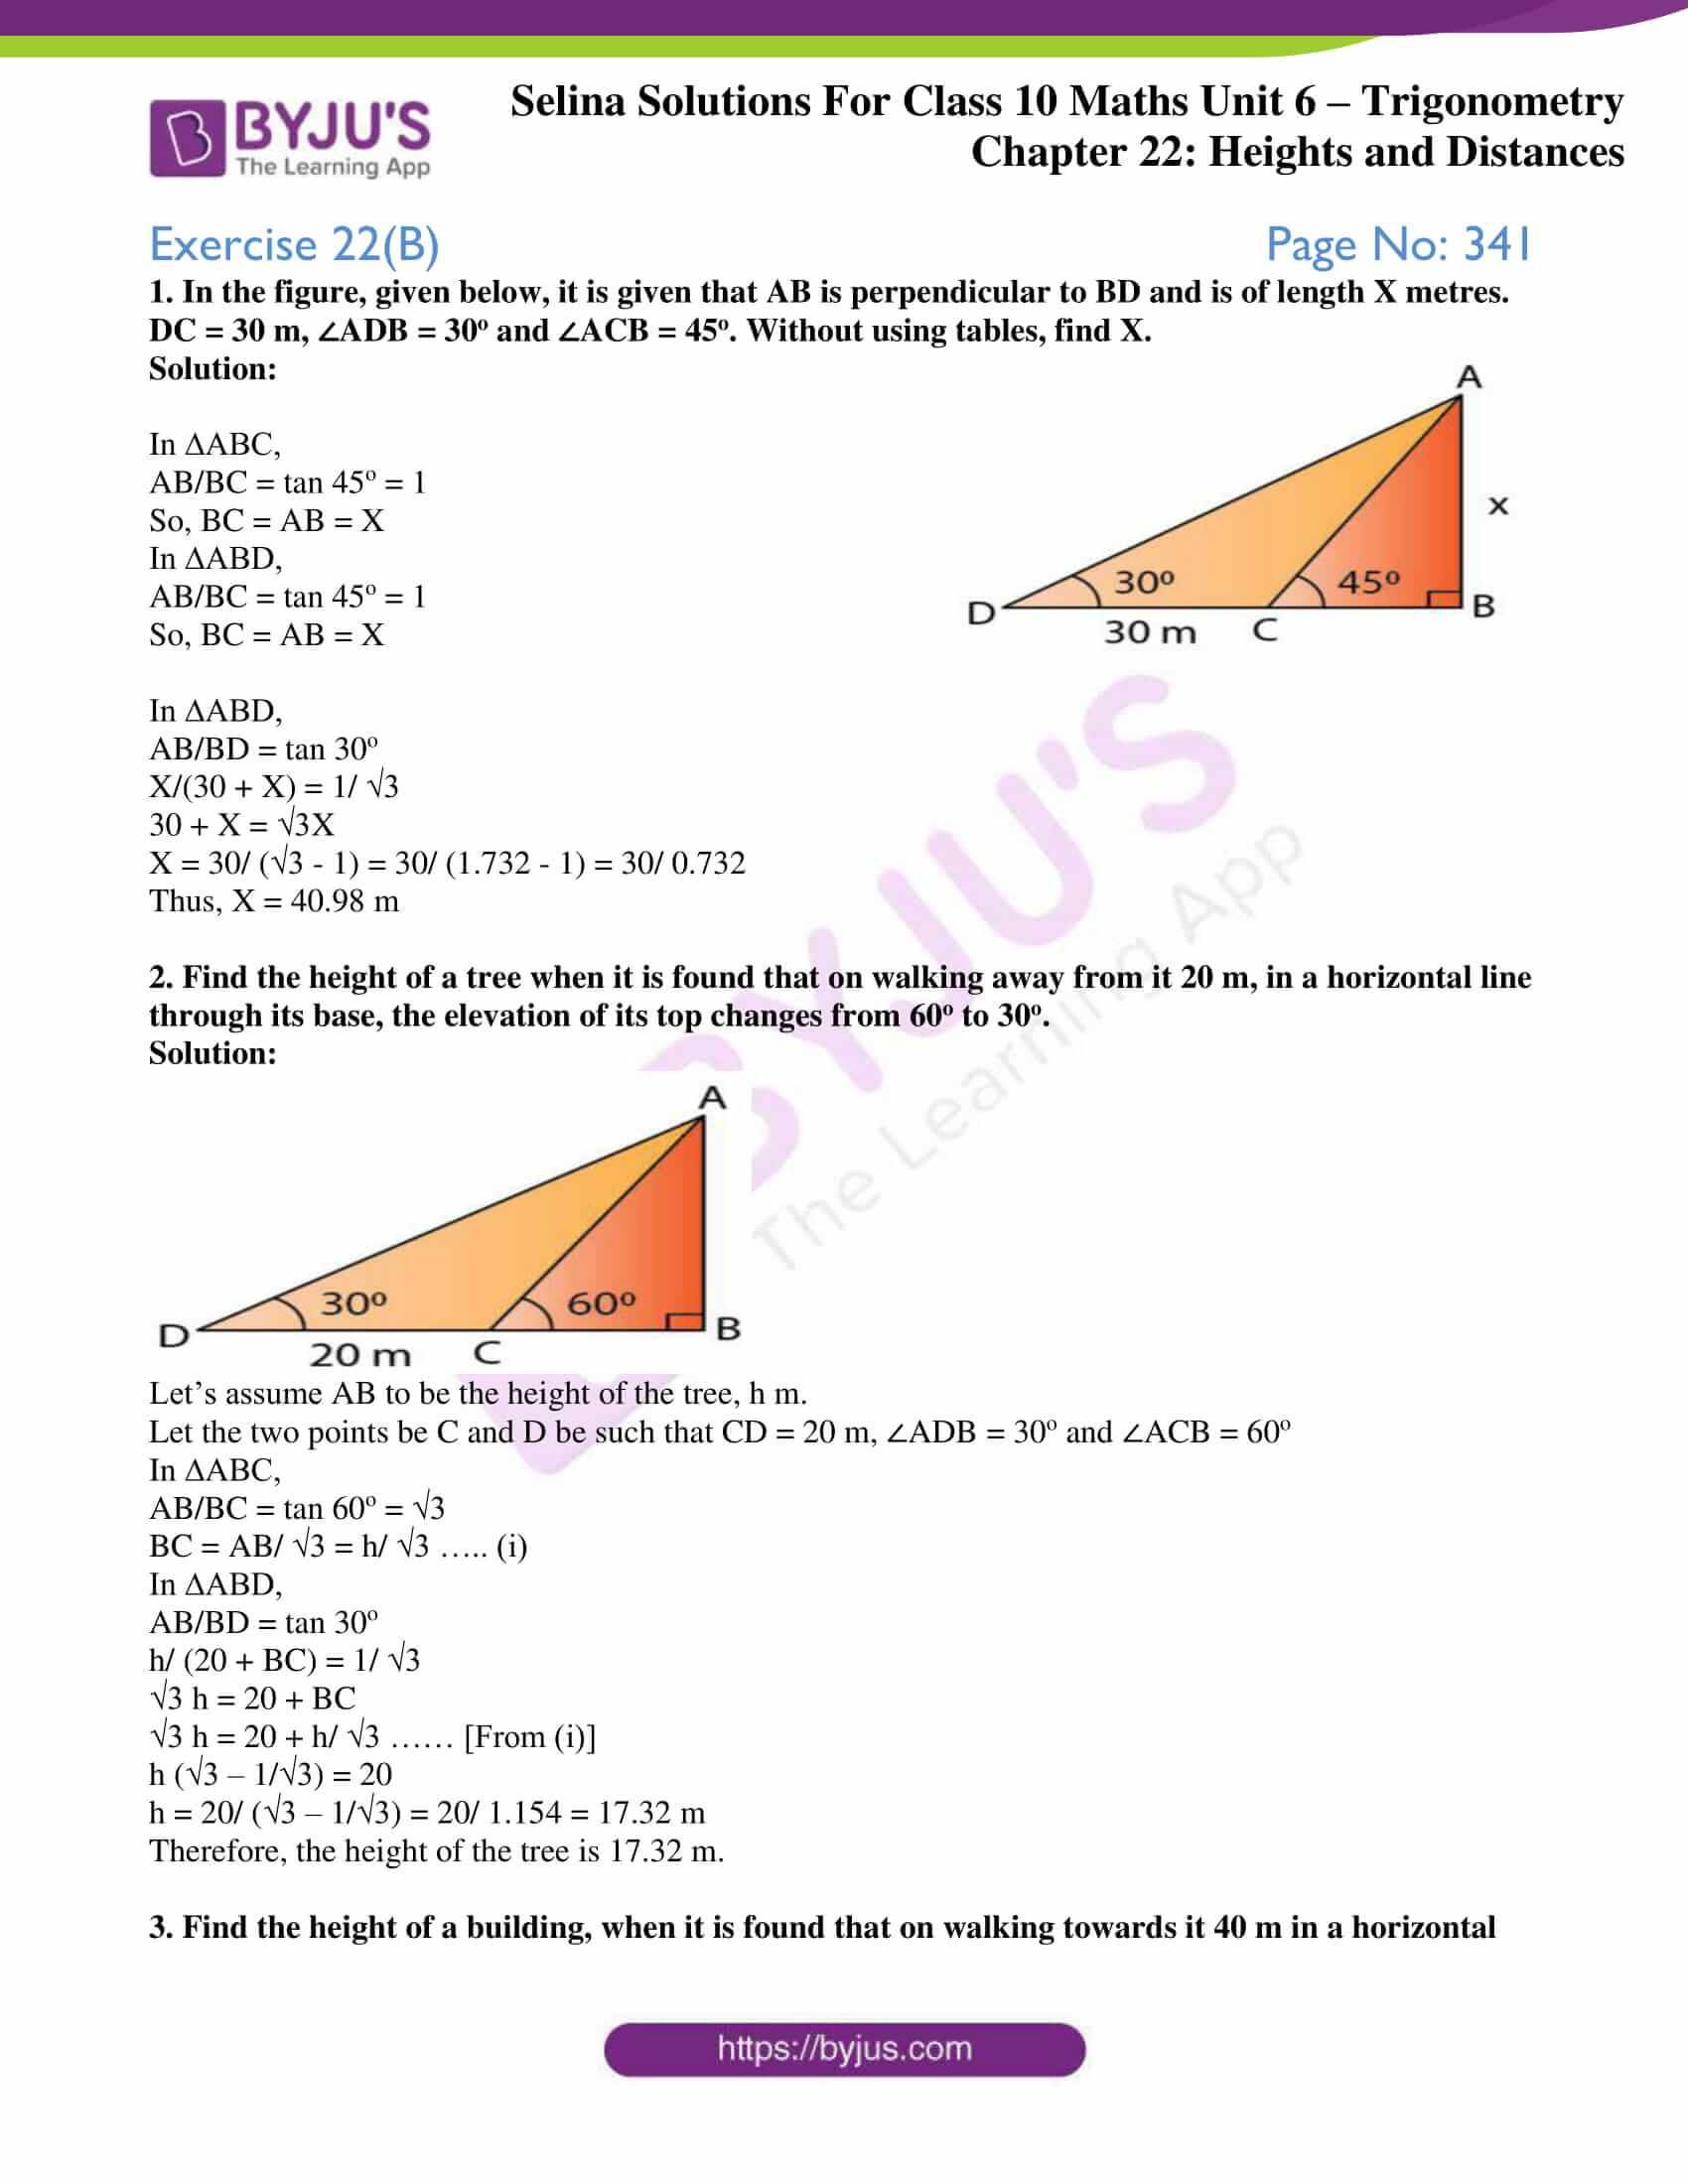 selina-sol-maths-class-10-ch-22-ex-b-1